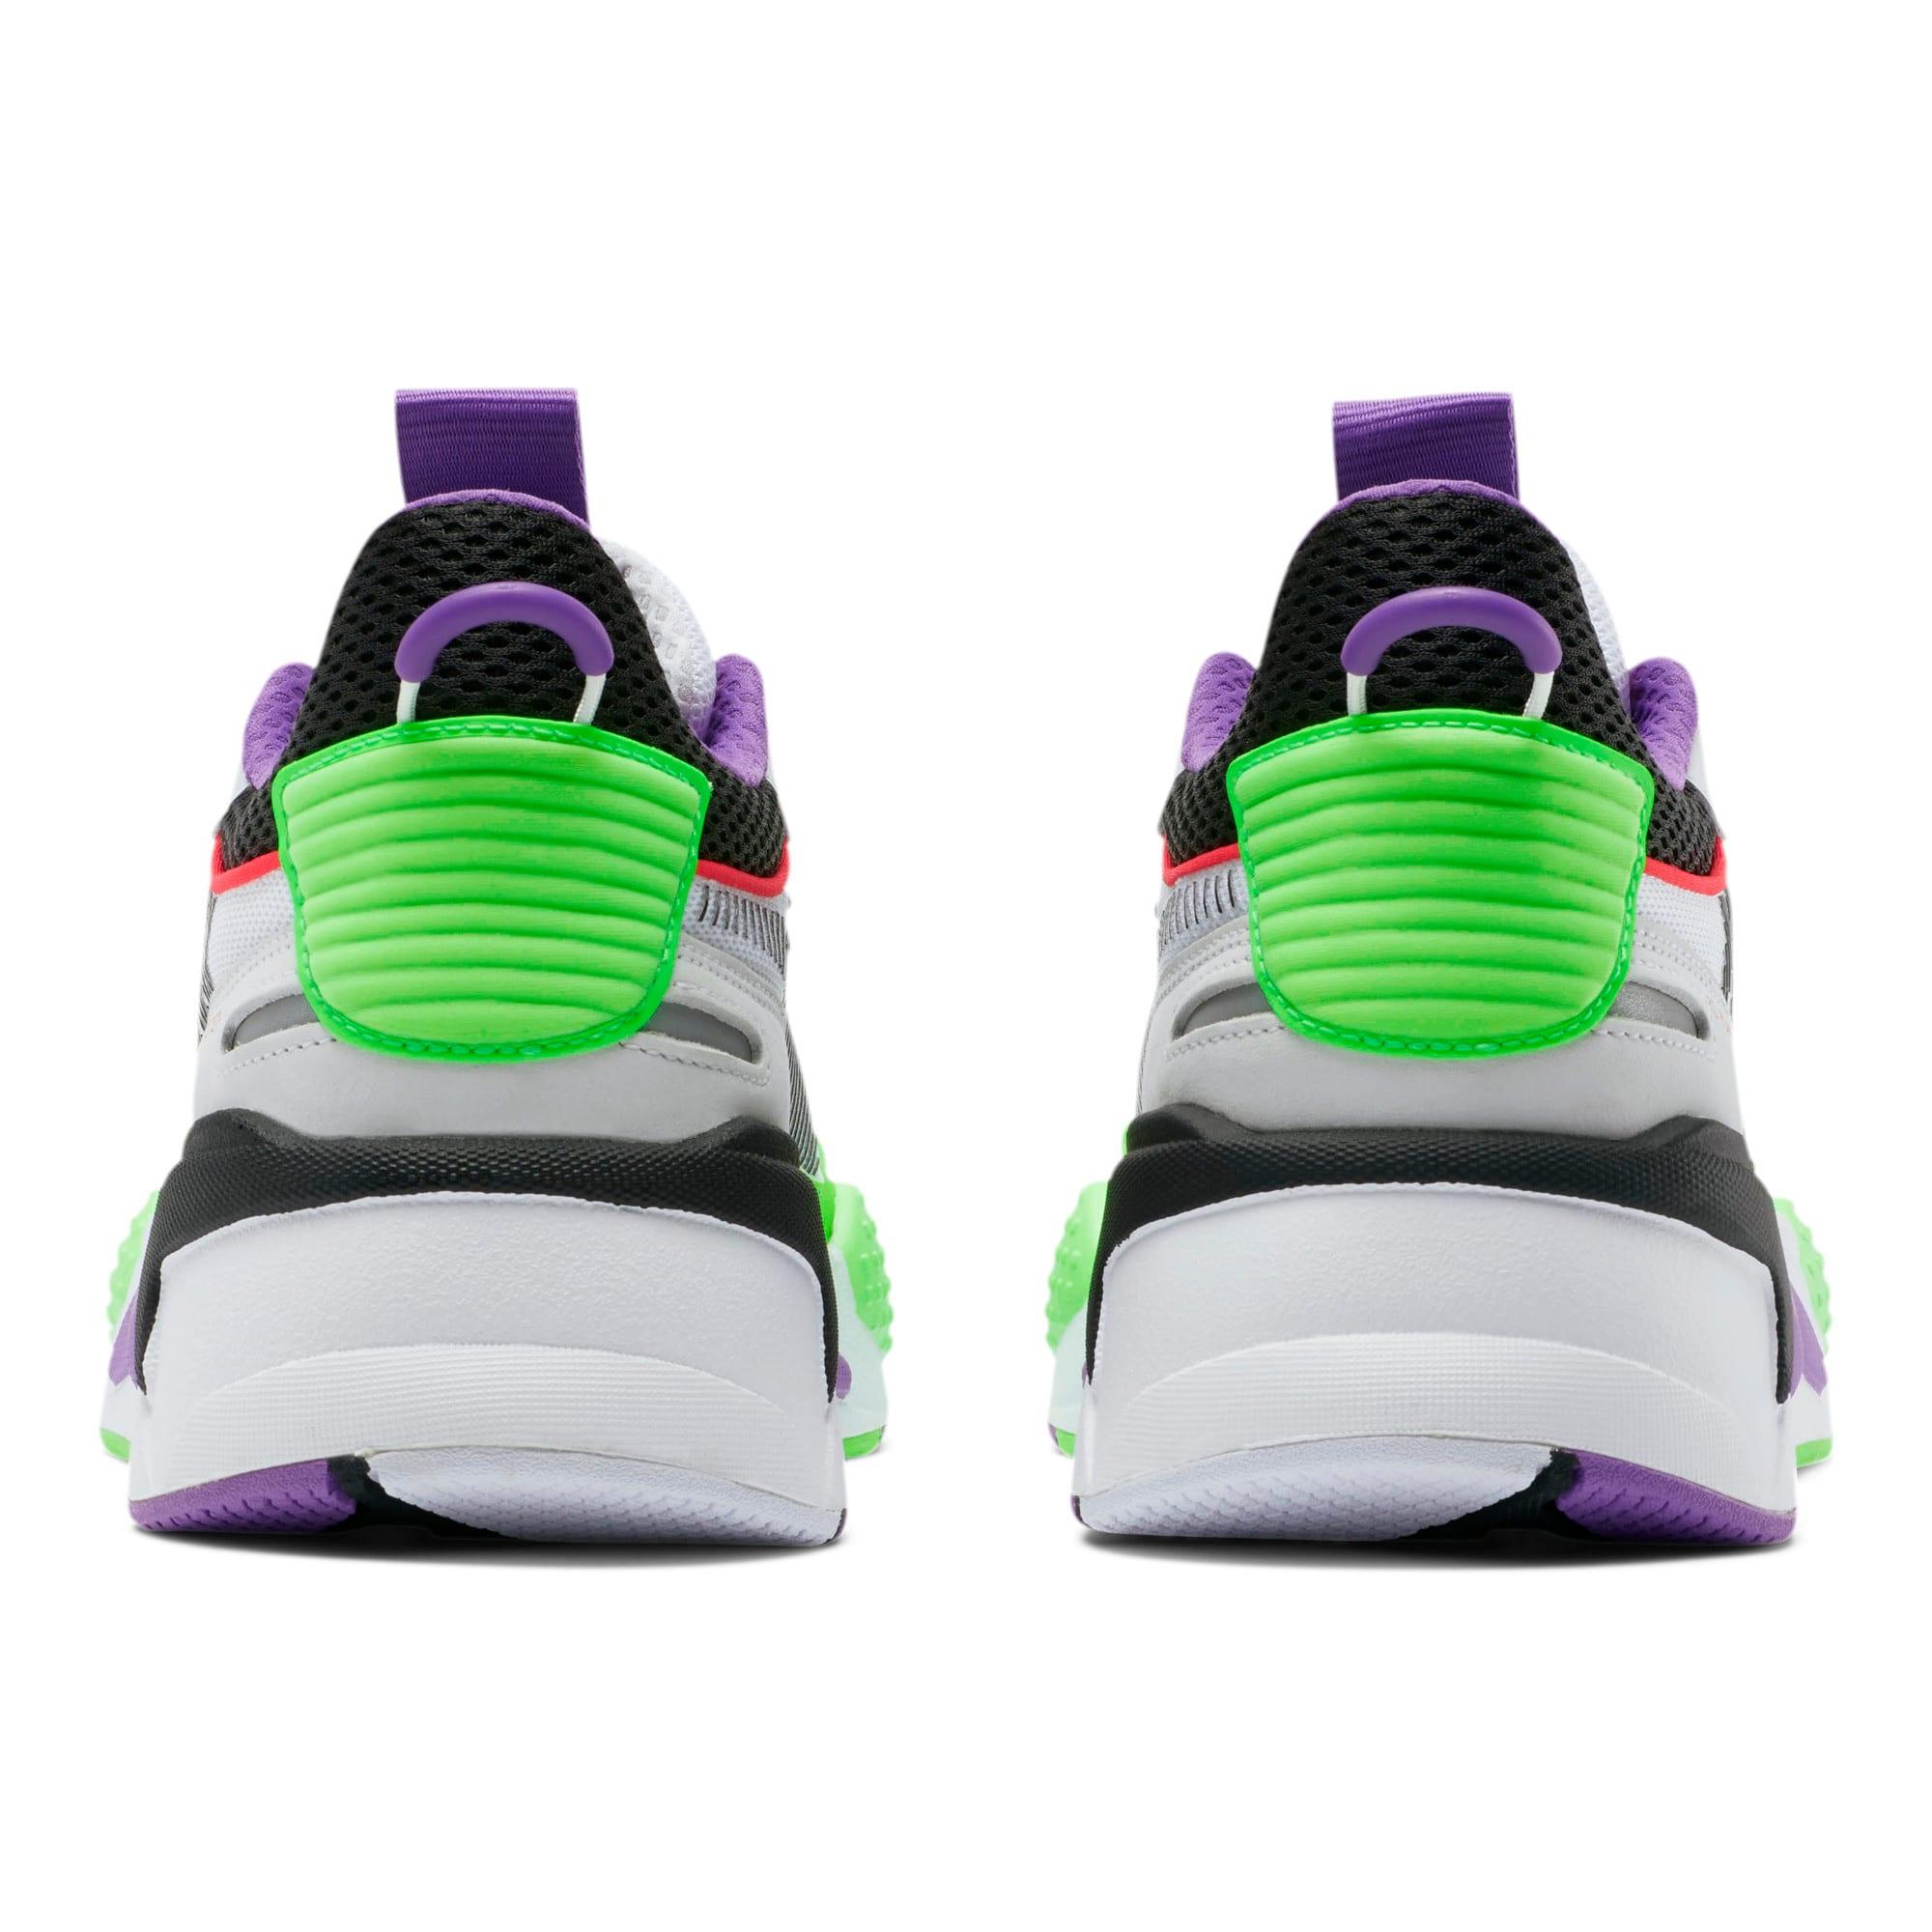 Thumbnail 3 of RS-X Bold Sneakers, PWhite-Gr Gecko-Royal Lilac, medium